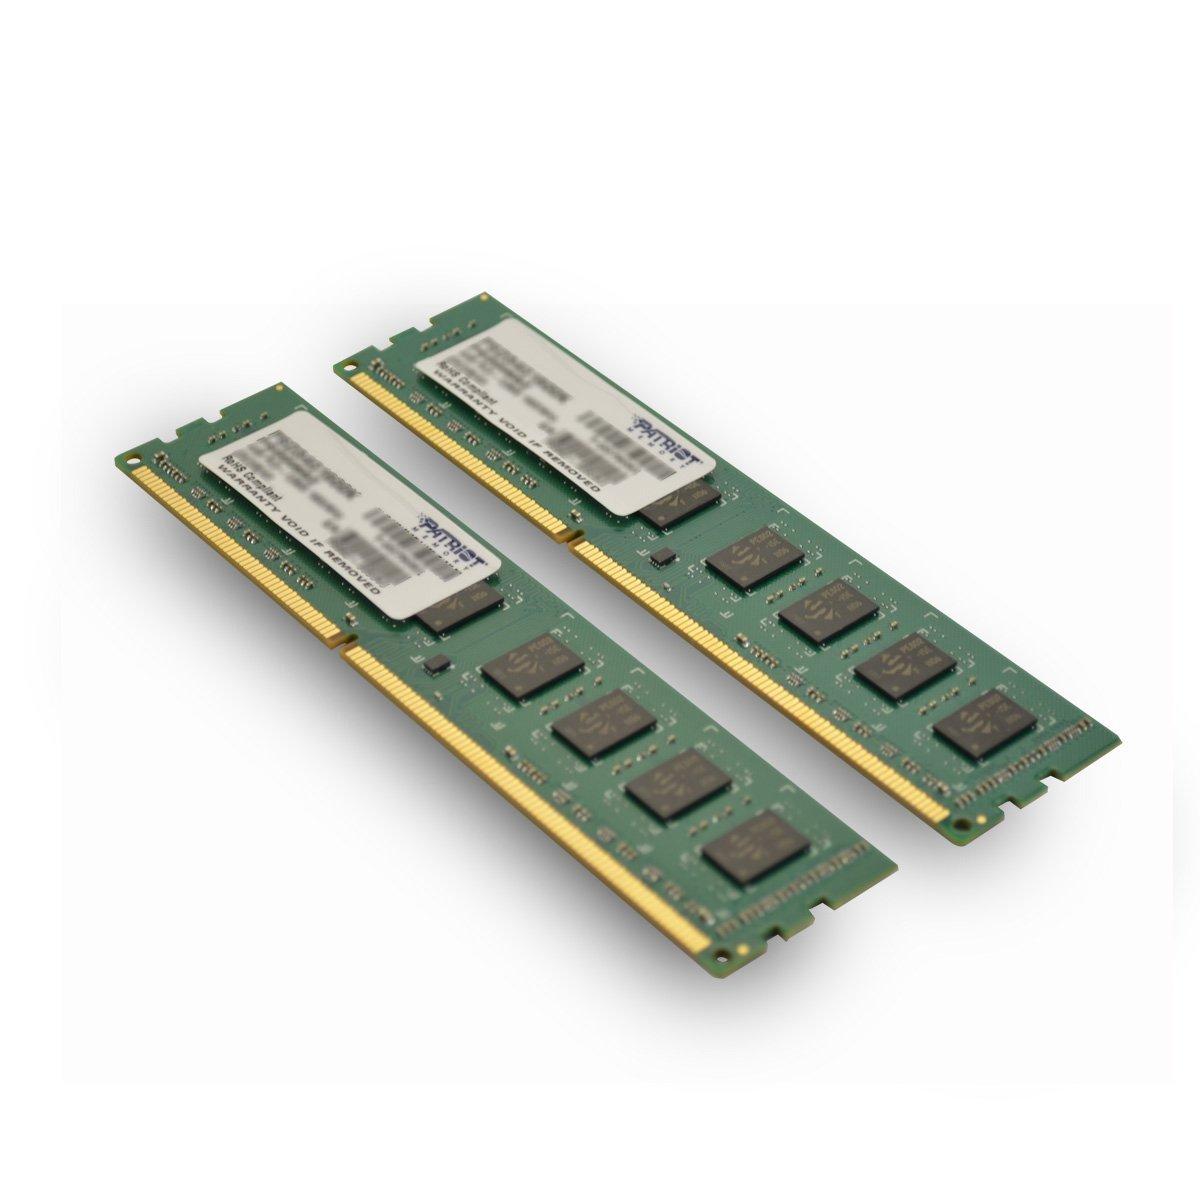 Patriot Signature DDR3 8 GB (2 x 4 GB) CL11 PC3-12800 (1600MHz) 240-Pin DDR3 Desktop Memory Kit PSD38G1600K